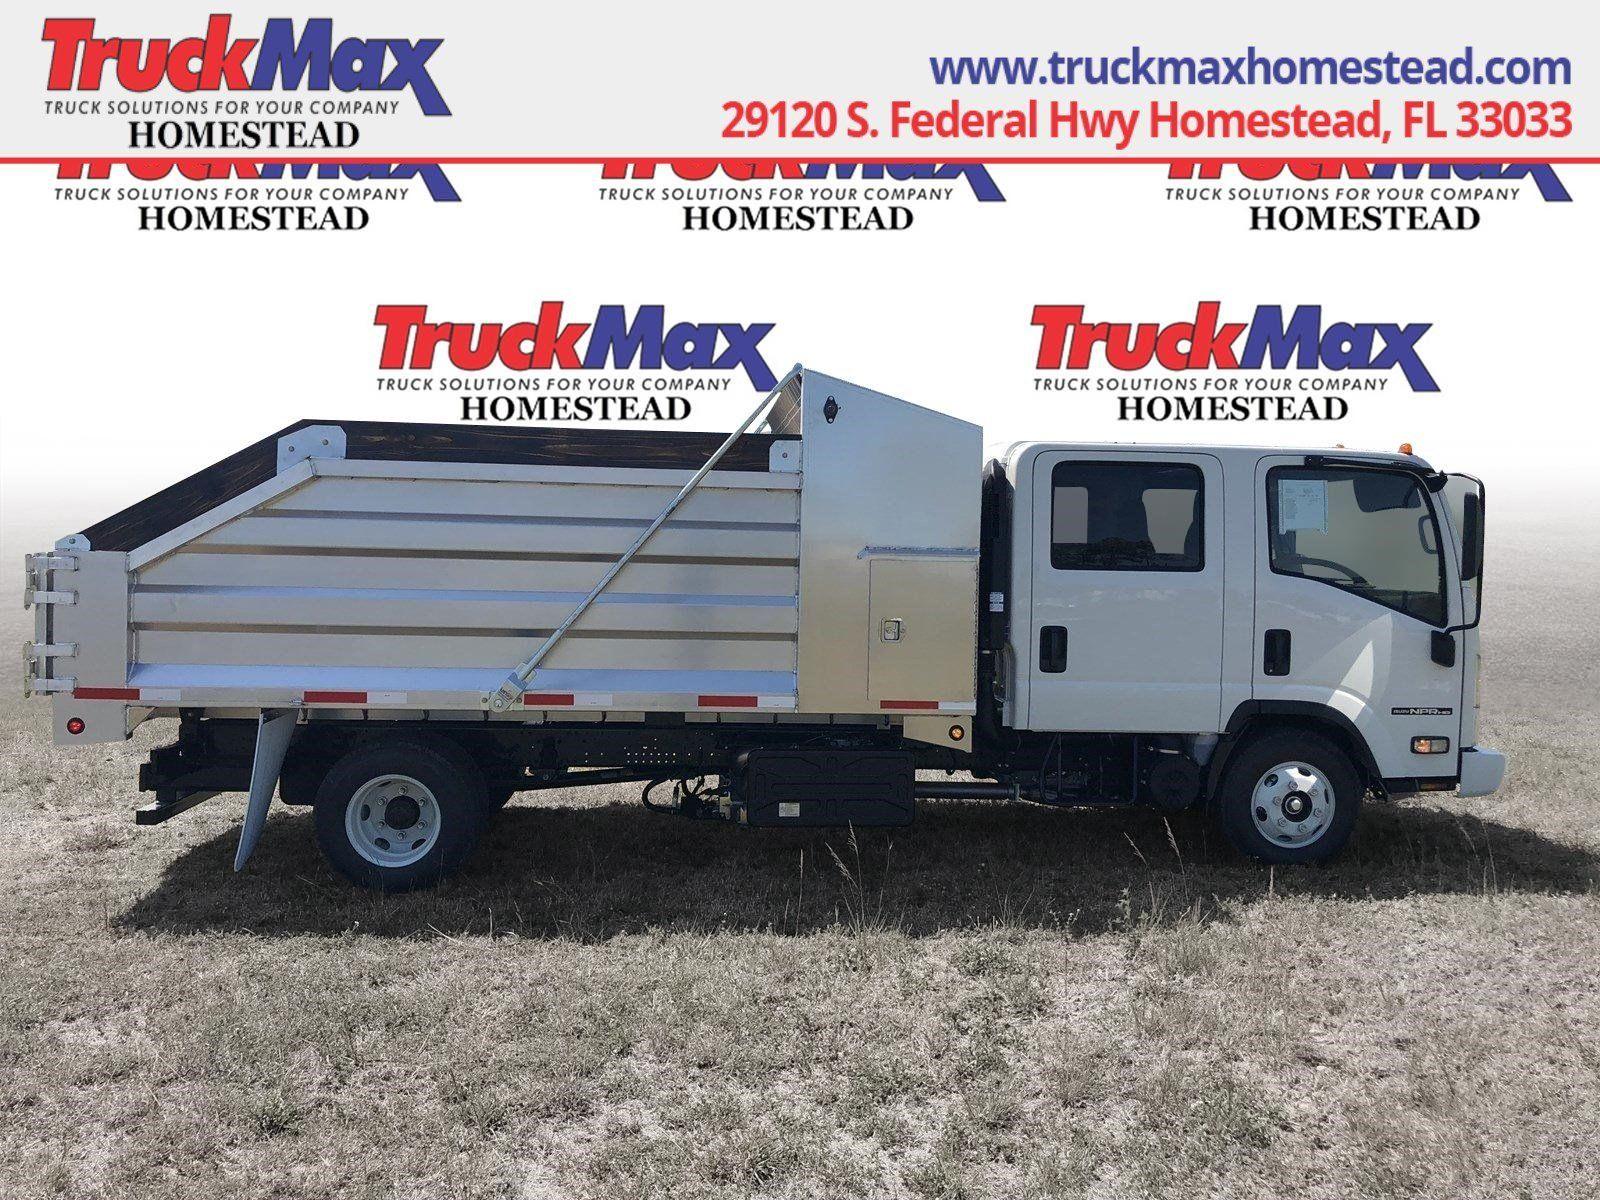 2018 Isuzu Npr Hd 14 Slanted Aluminum Landscape Dump Truck Crew Cab Gas Call 833 460 6501 For More Information Trucks Cool Landscapes Dump Truck